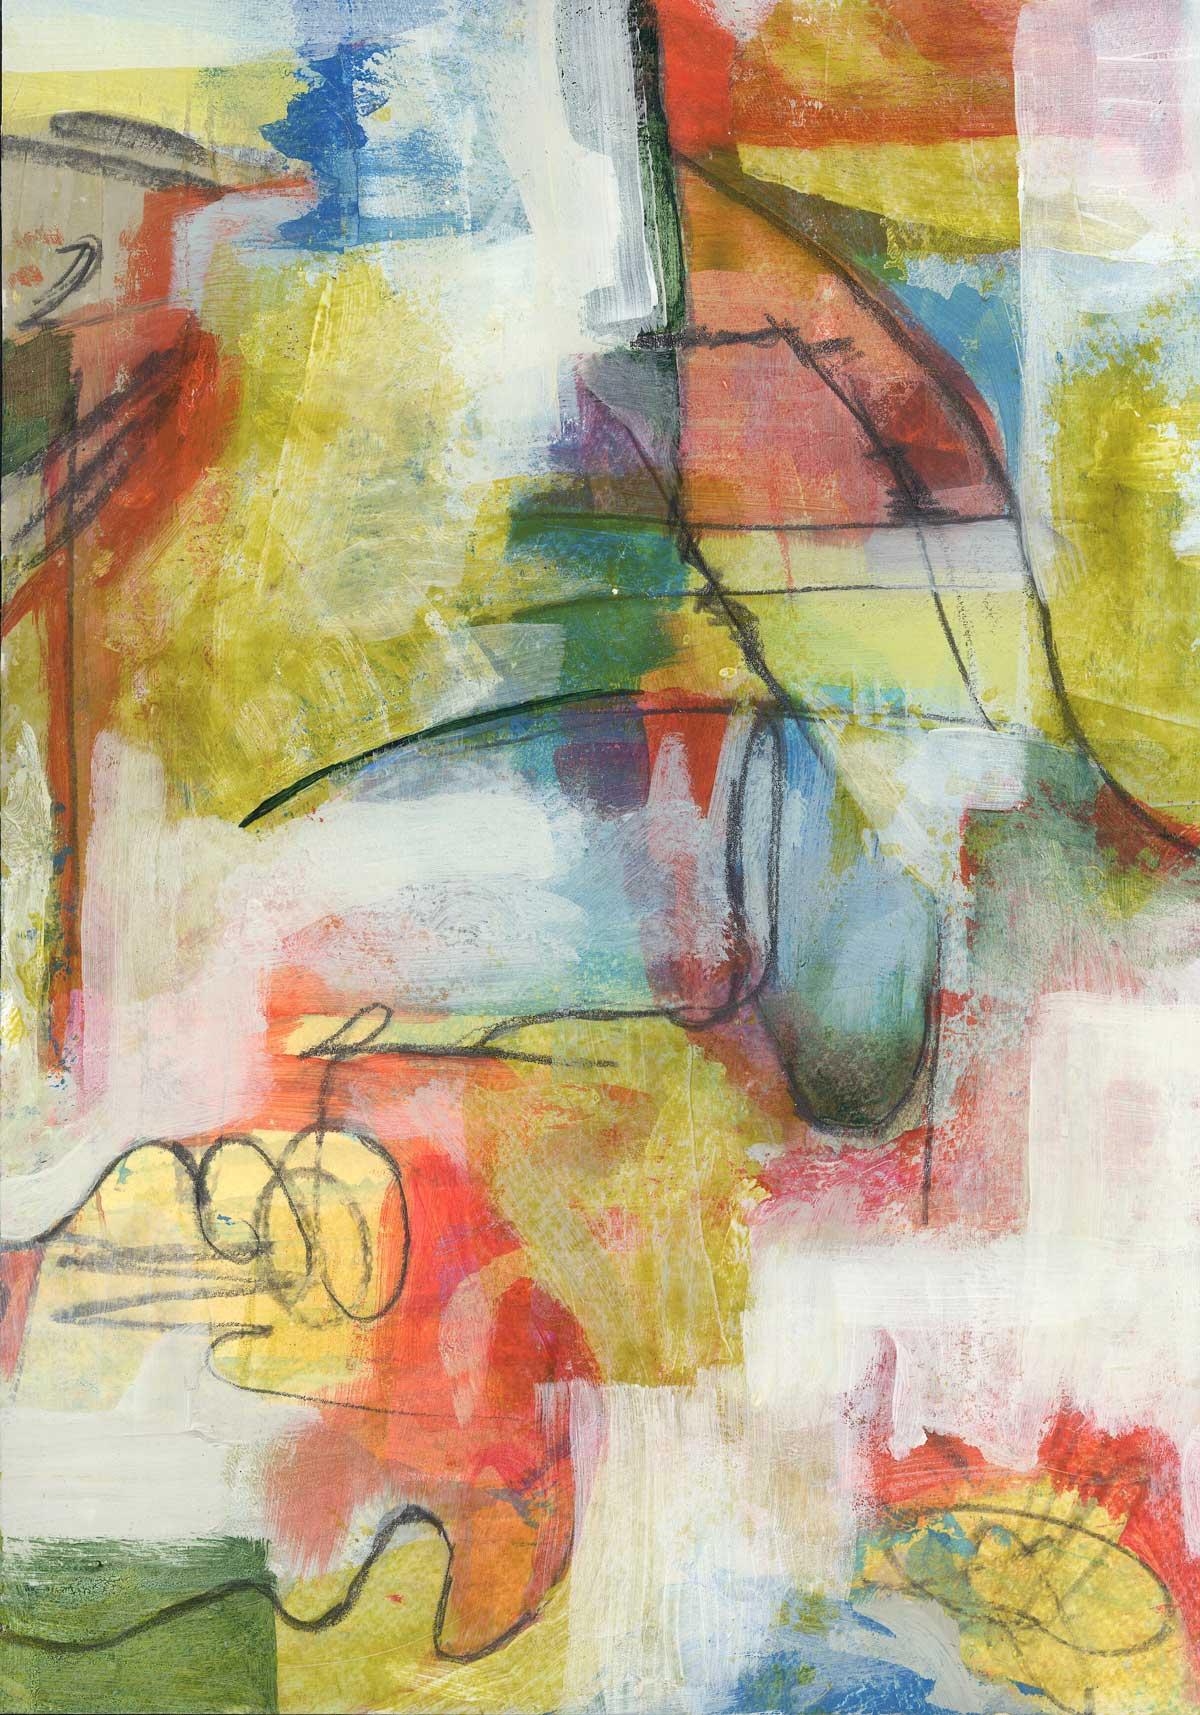 Speed Painting 8 by Janet Jaffke